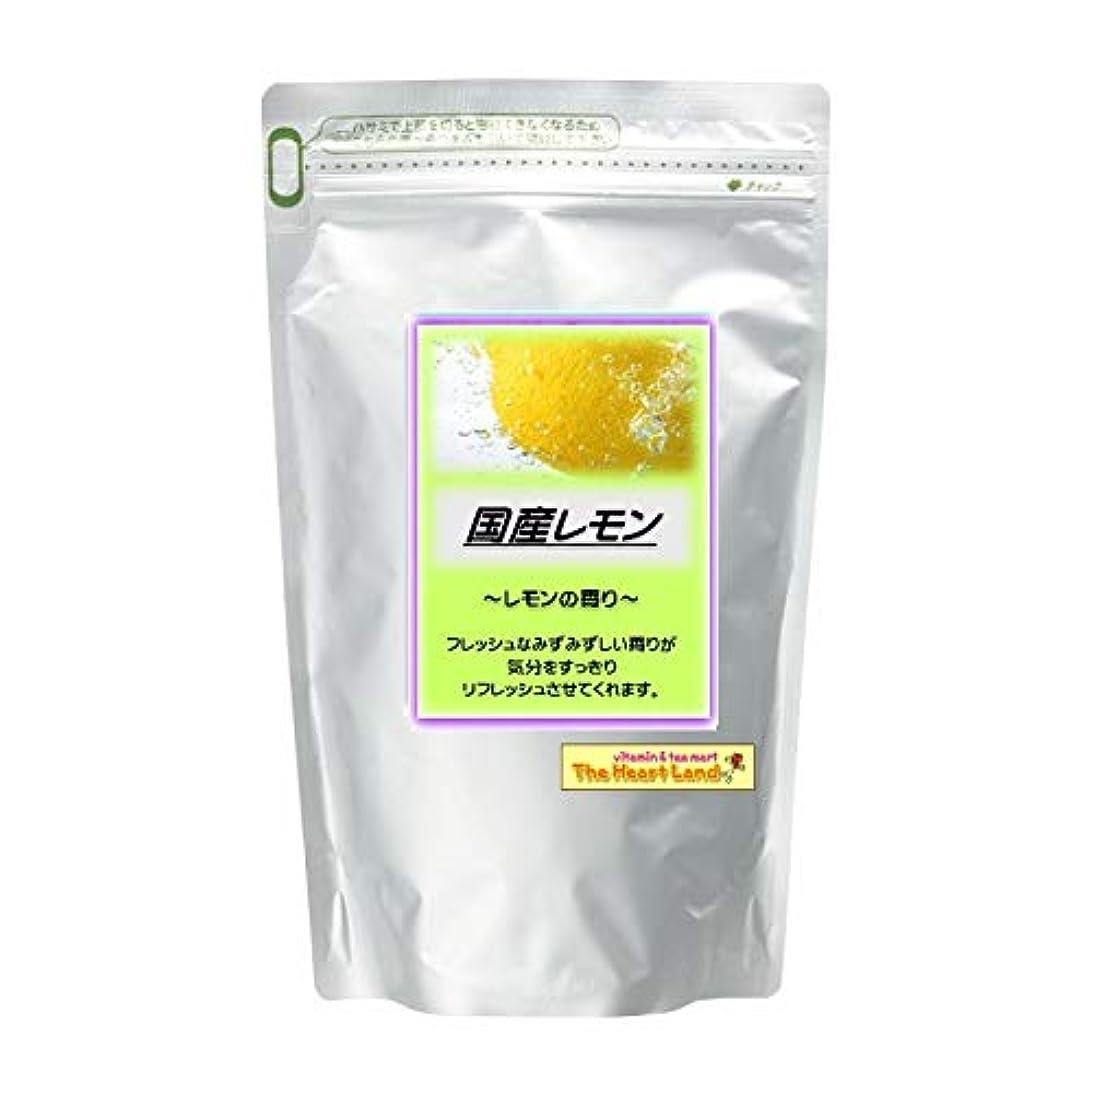 嫉妬大惨事崩壊アサヒ入浴剤 浴用入浴化粧品 国産レモン 300g